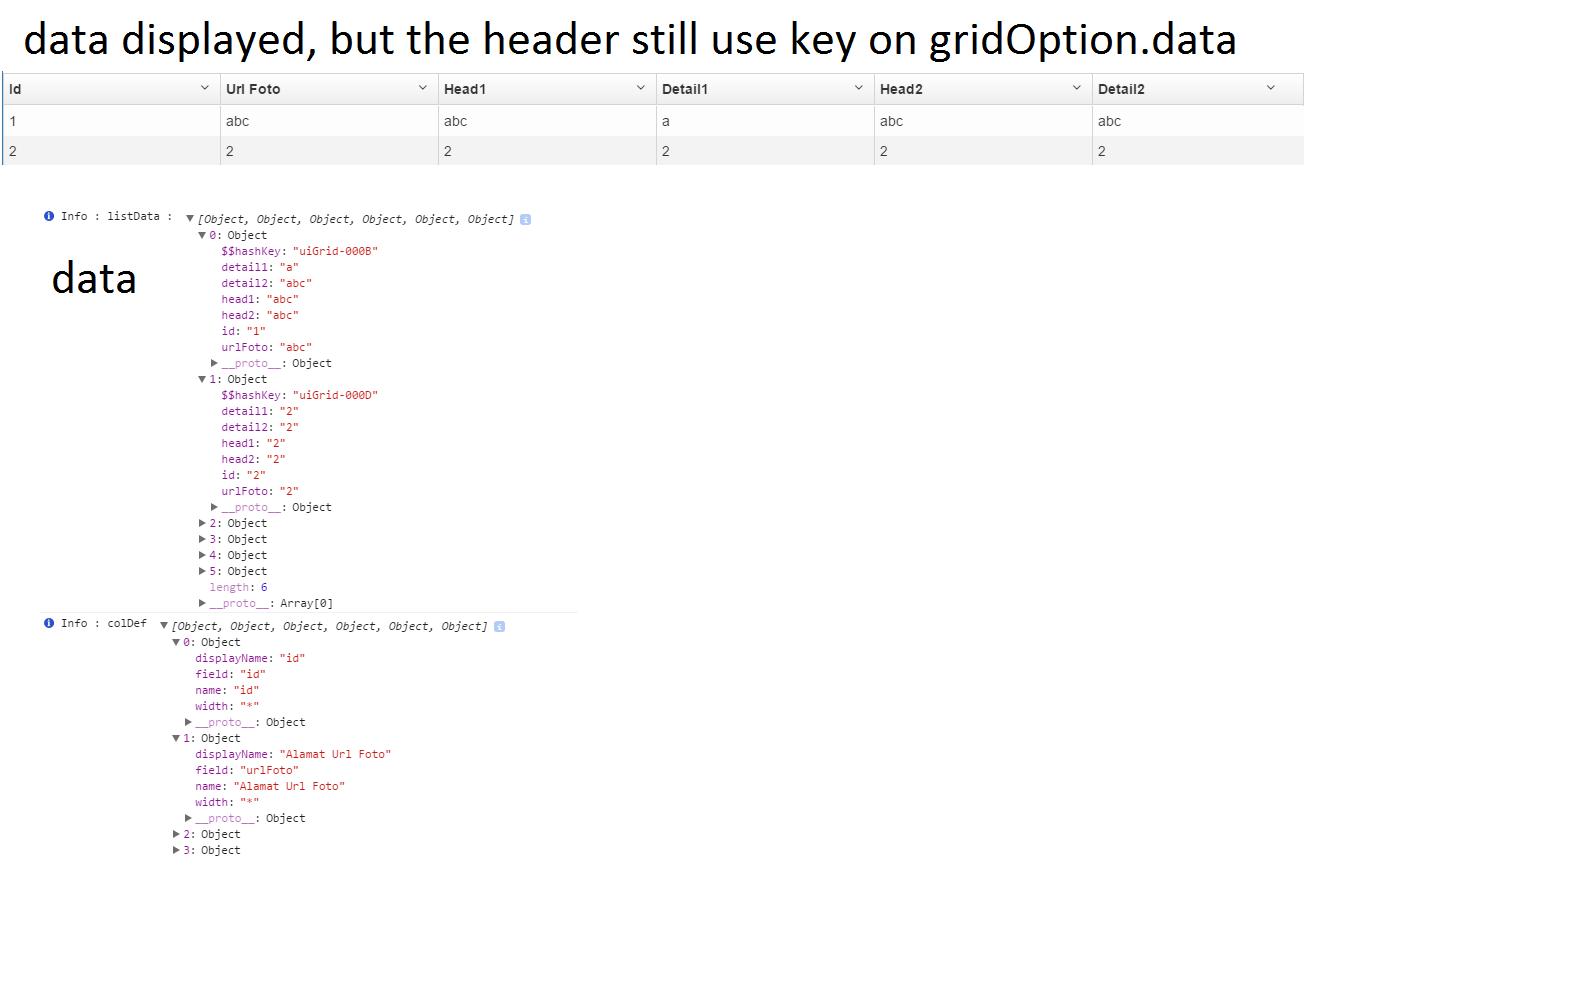 angular-ui/ui-grid - Gitter